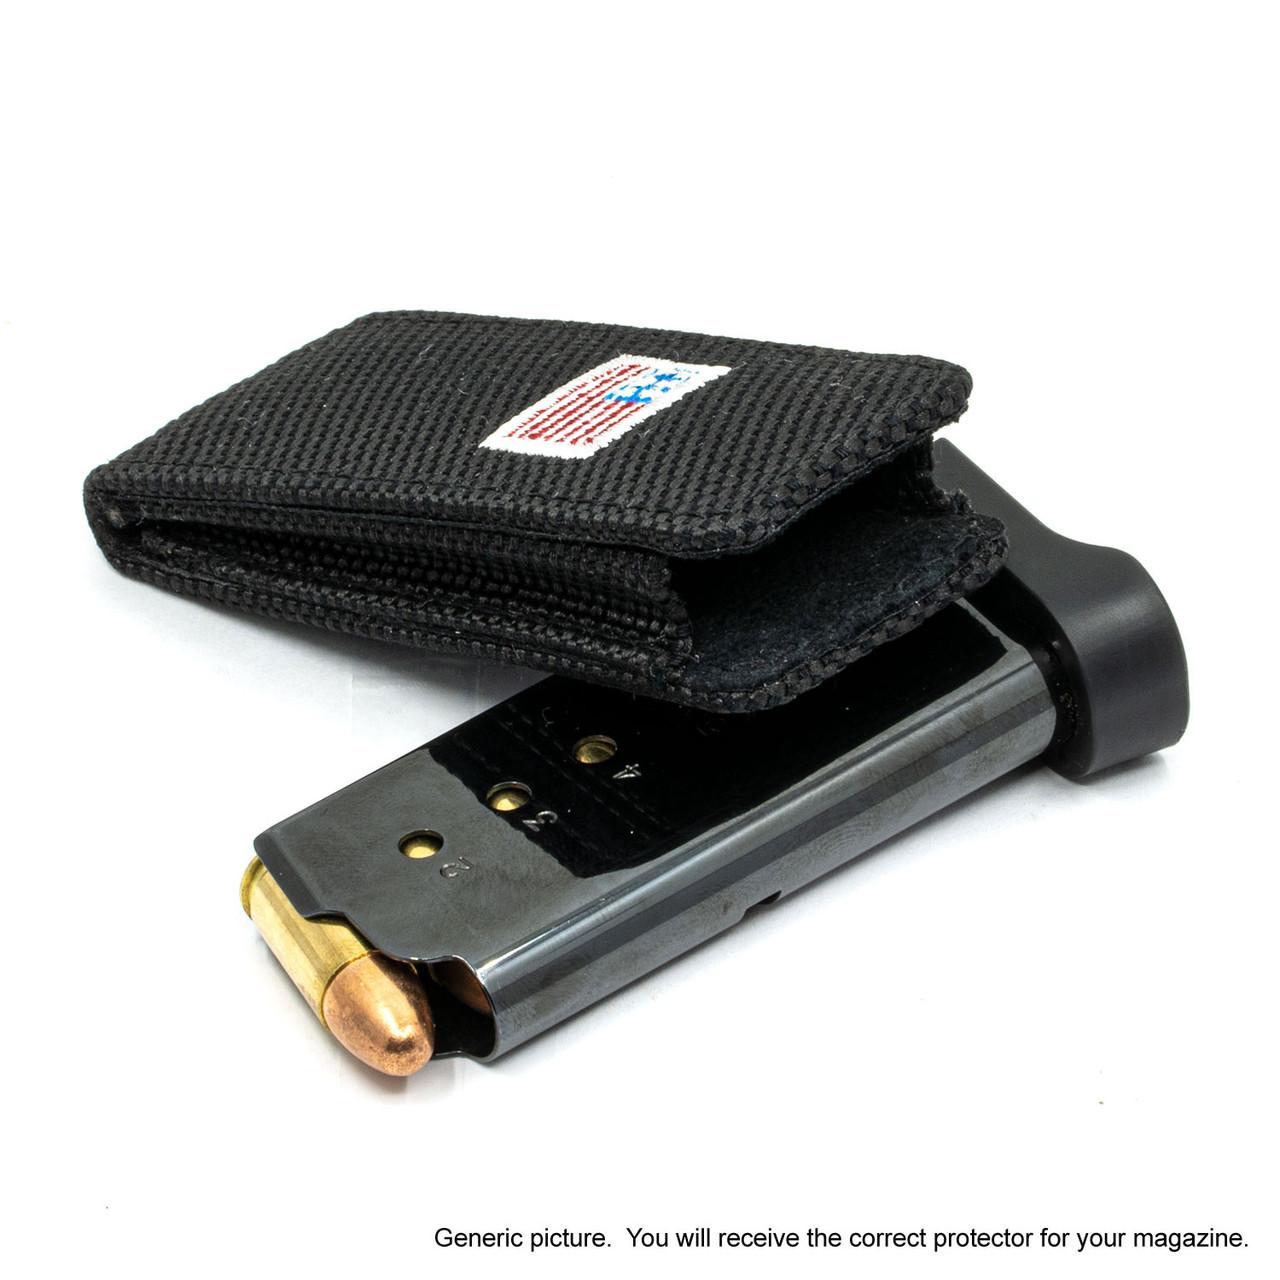 Beretta 84fs Cheetah Black Flag Magazine Pocket Protector